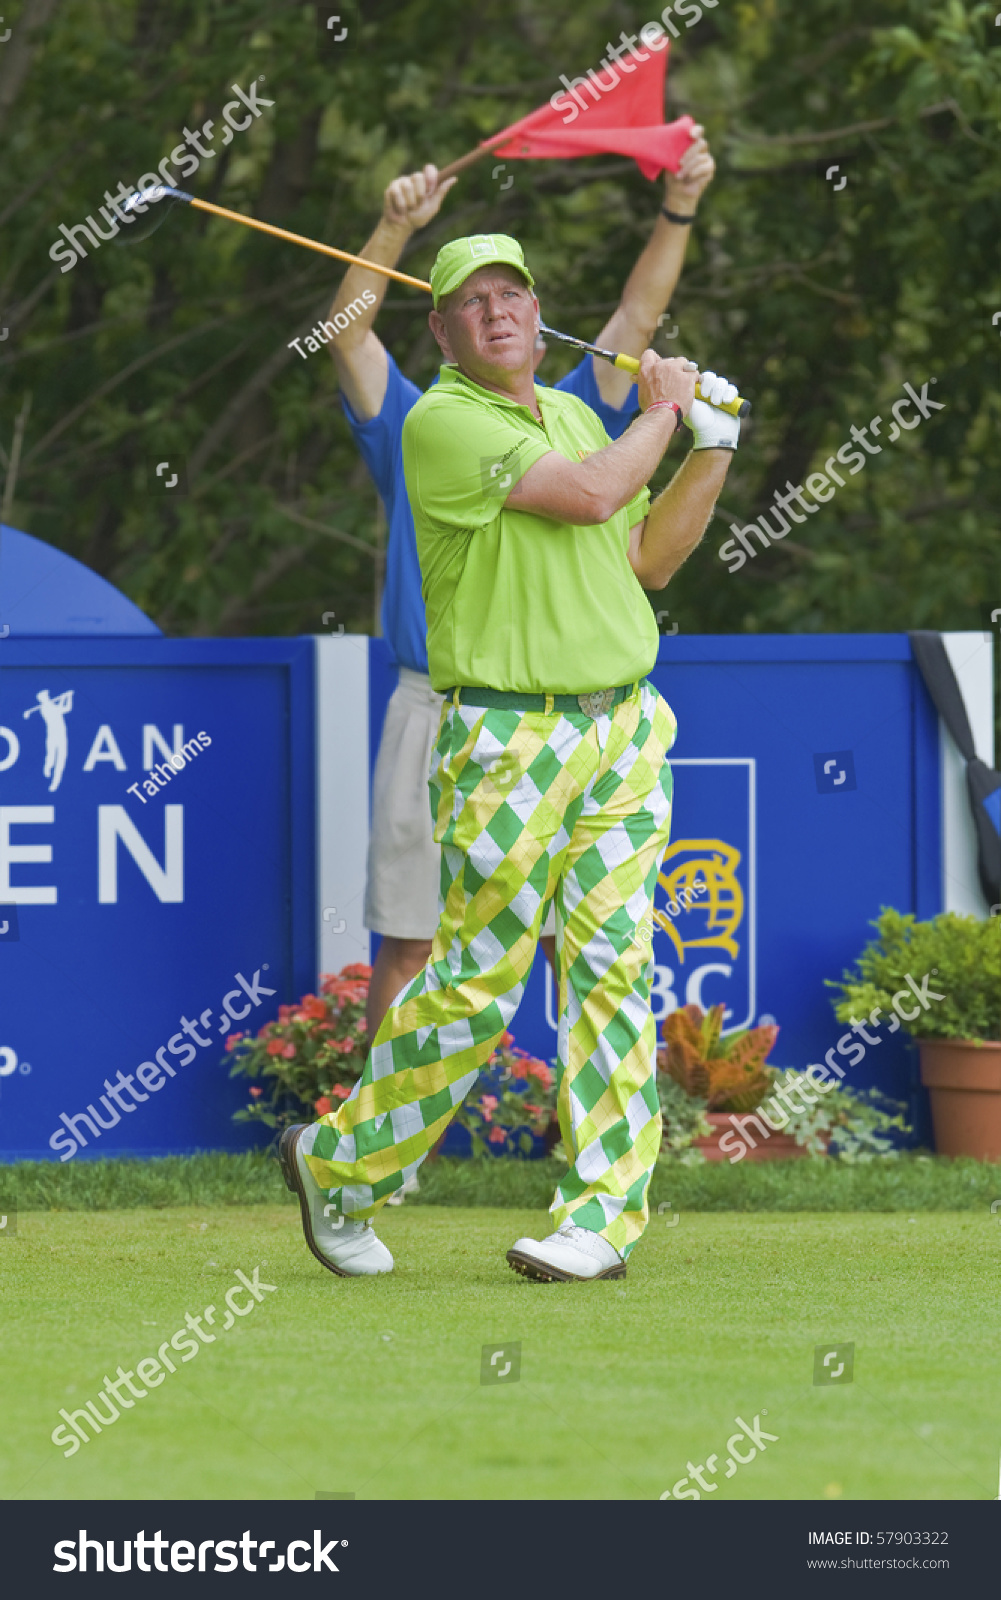 stock-photo-toronto-ontario-july-us-golf